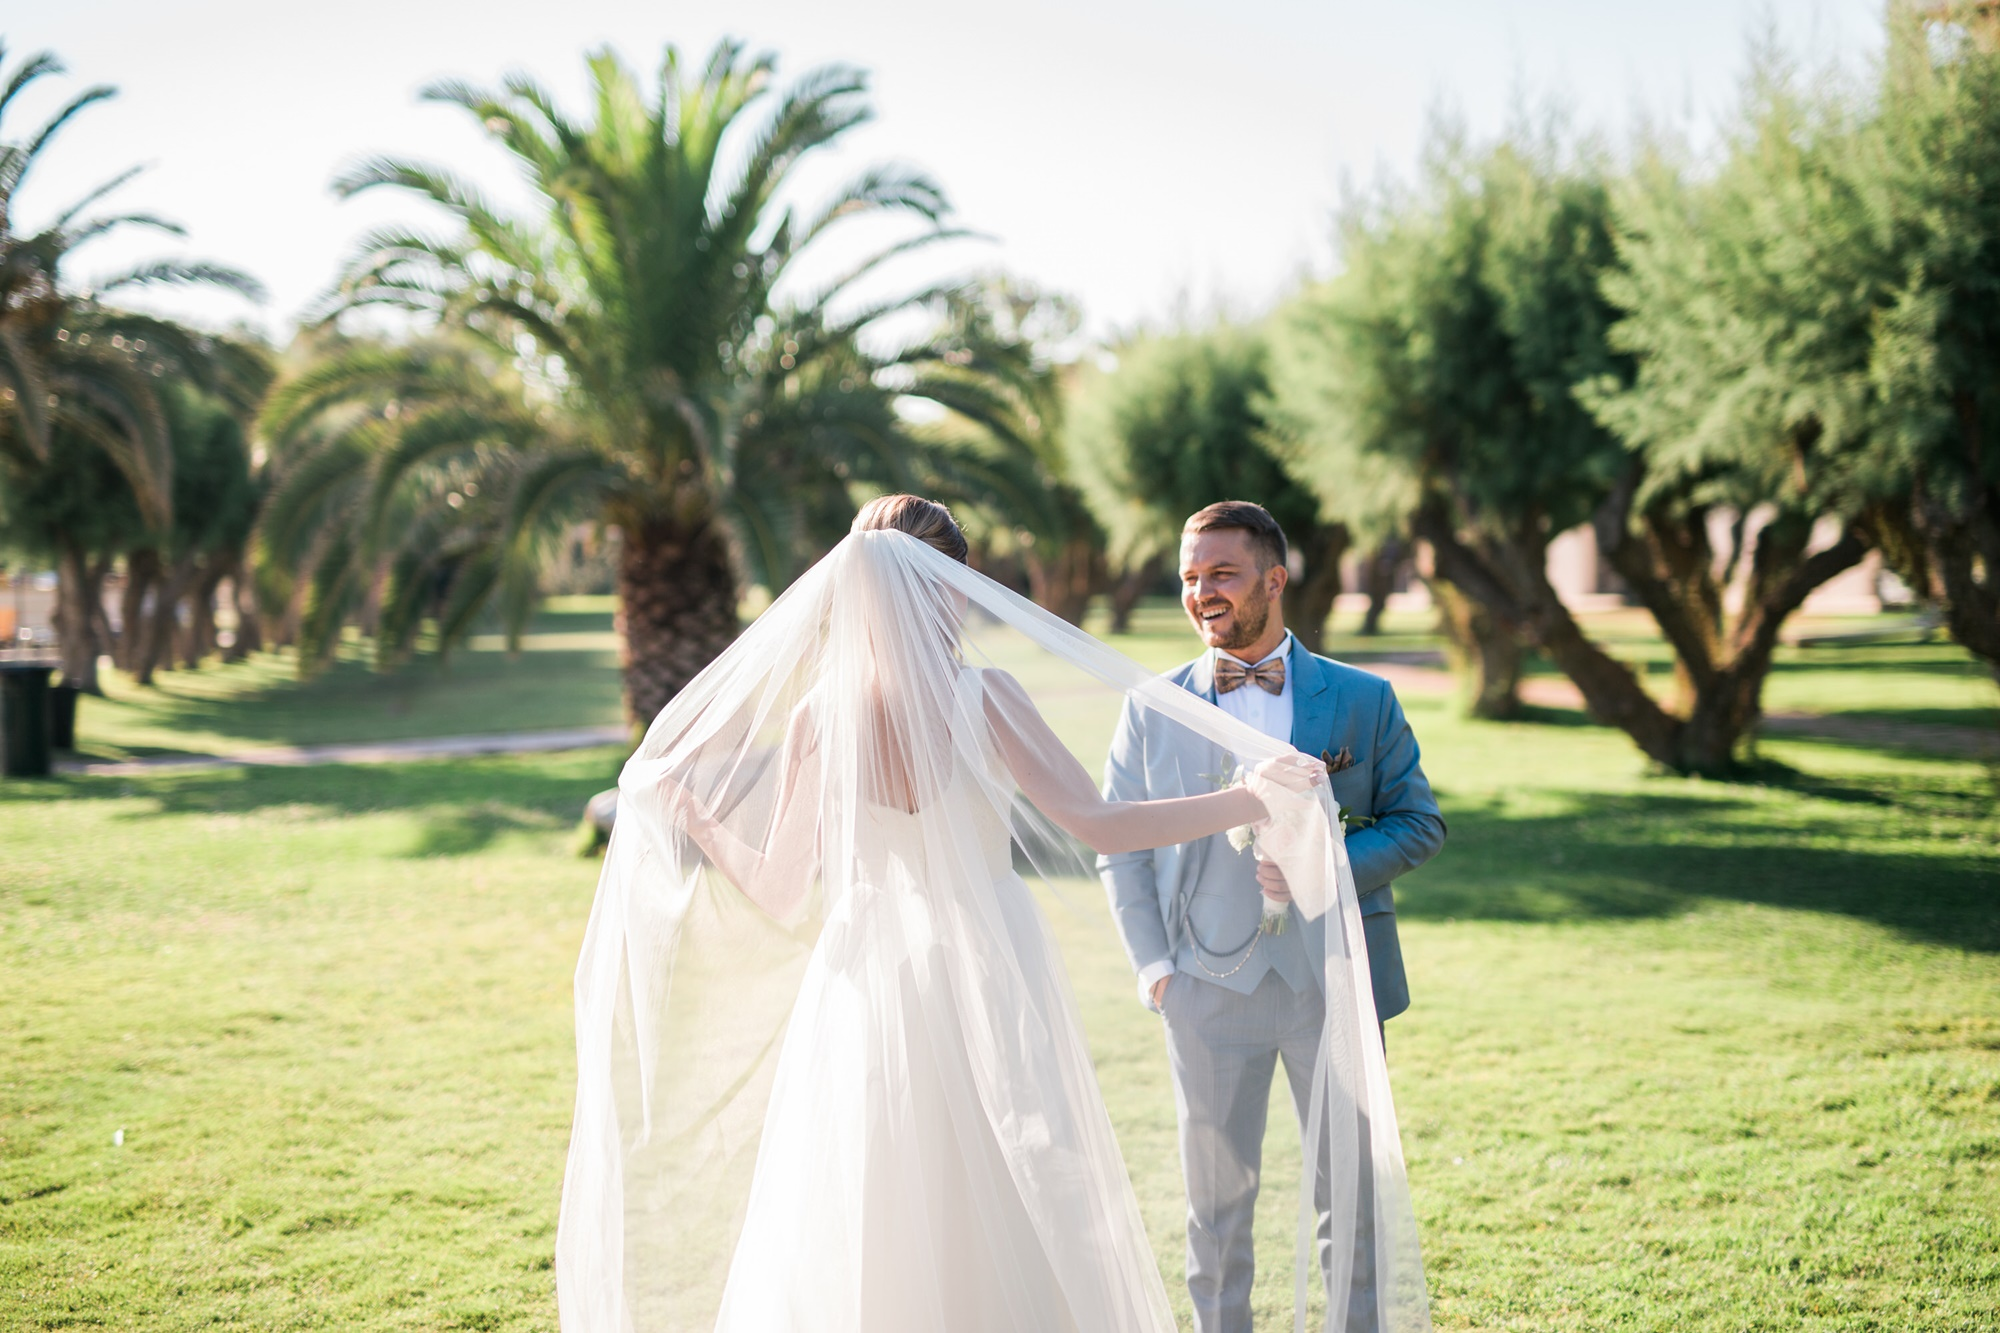 f4f10ab6d375 Καλοκαιρινός γάμος στην Ανάβυσσο με παστέλ χρώματα